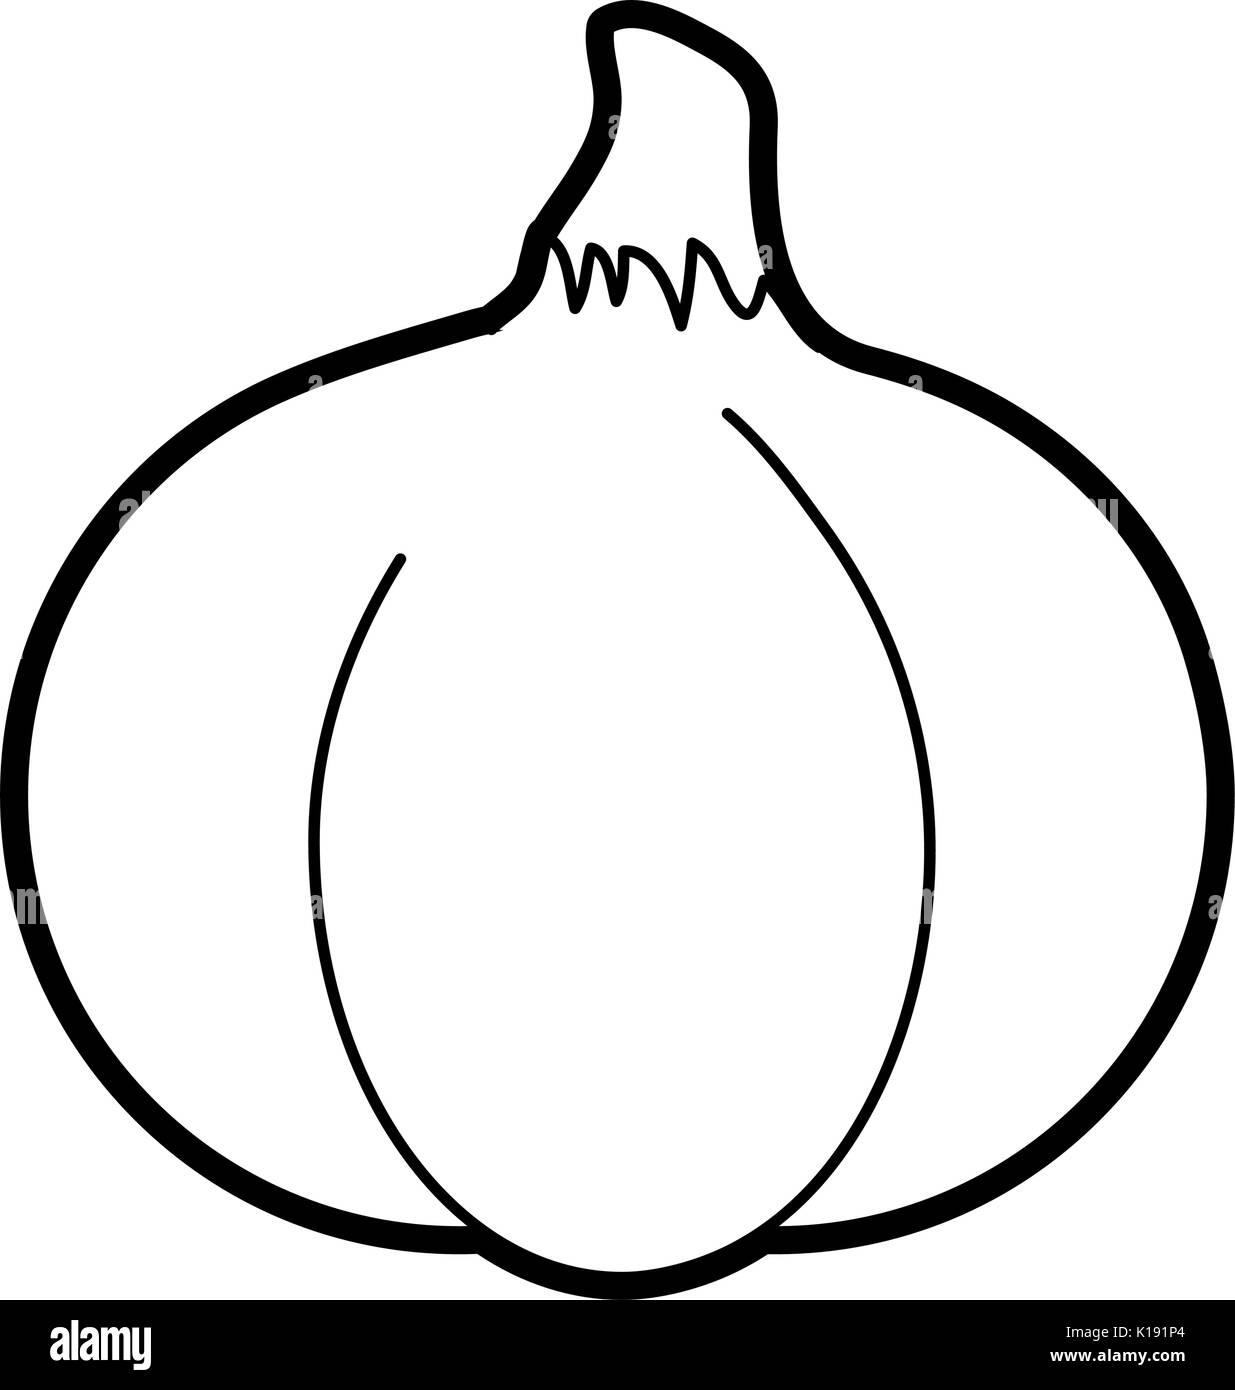 Spicy garlic vegetable - Stock Vector